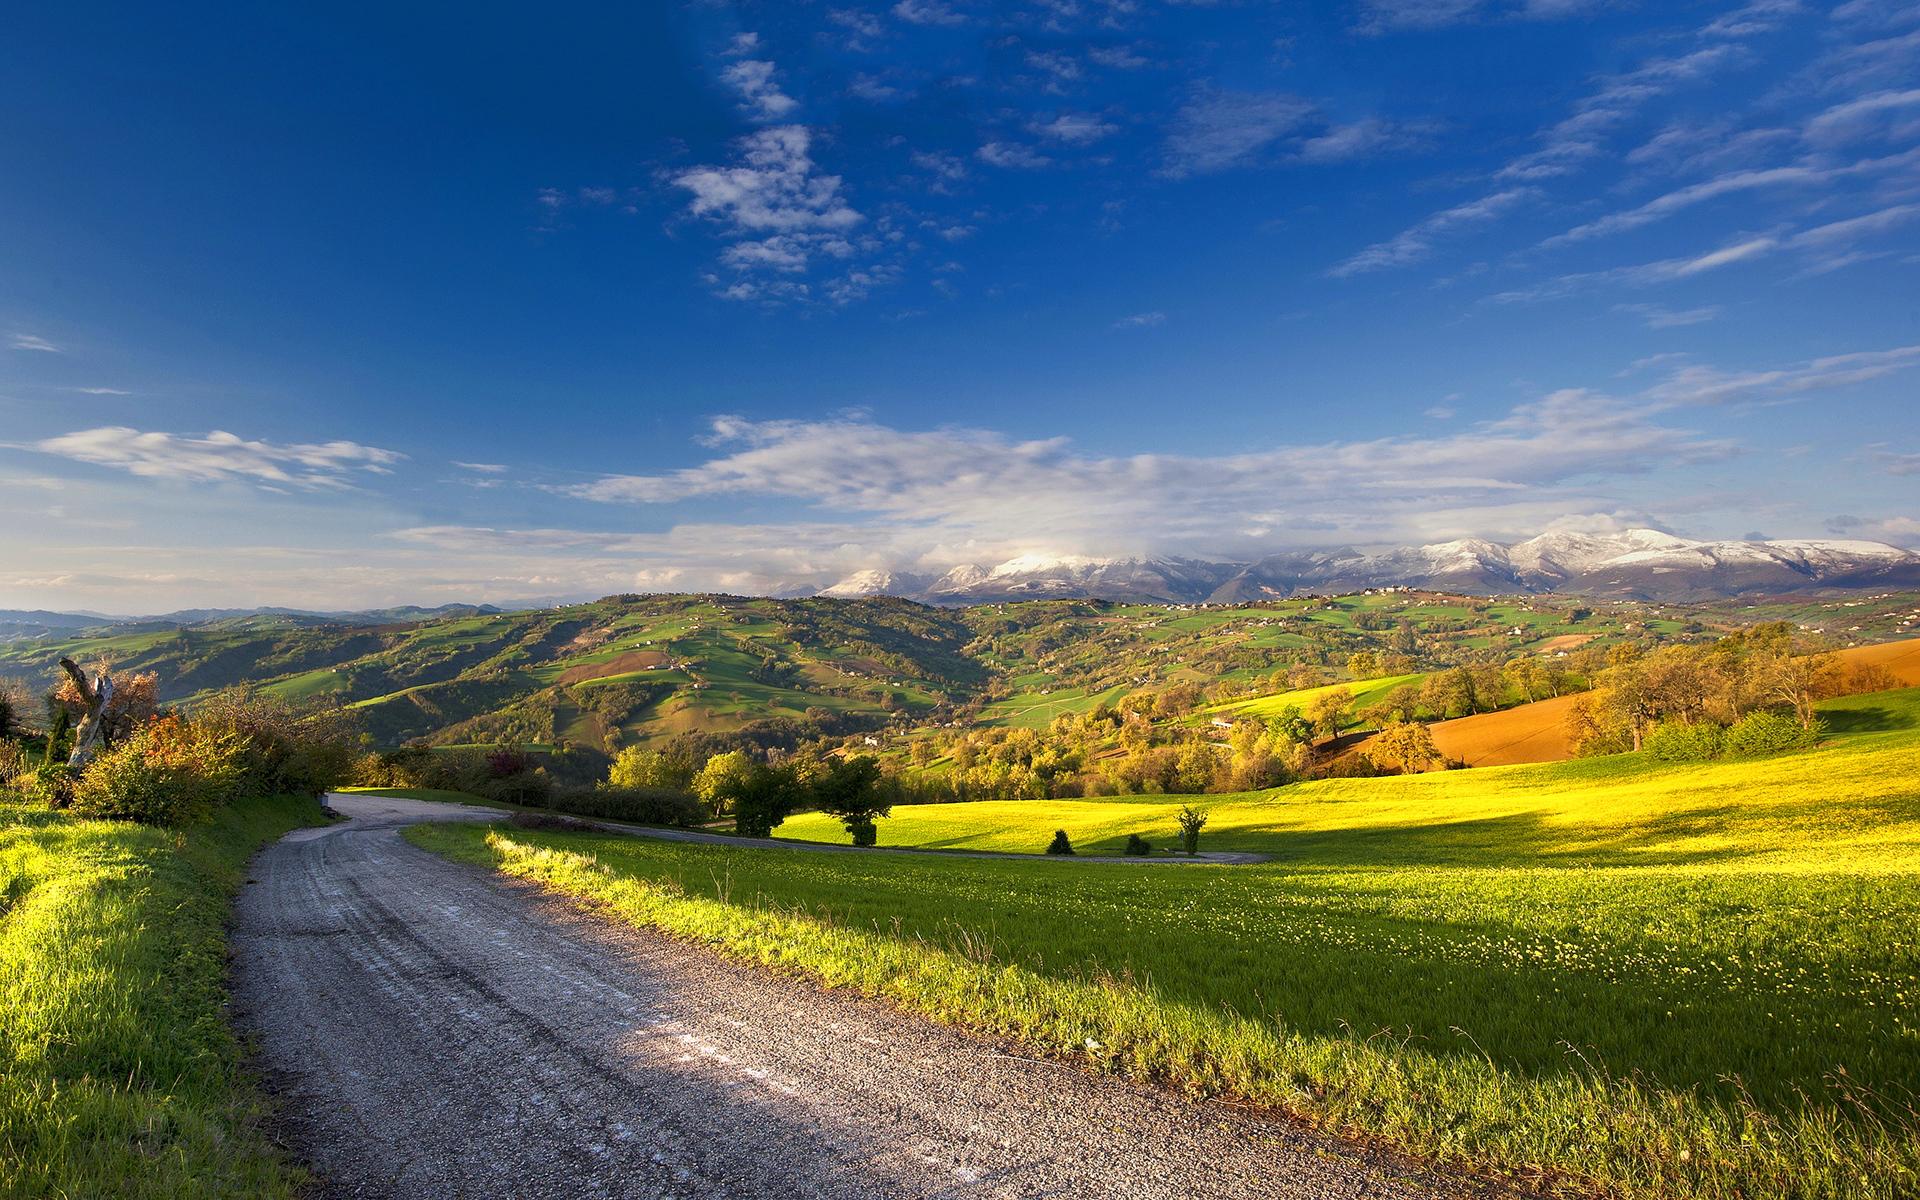 landscape beautiful road